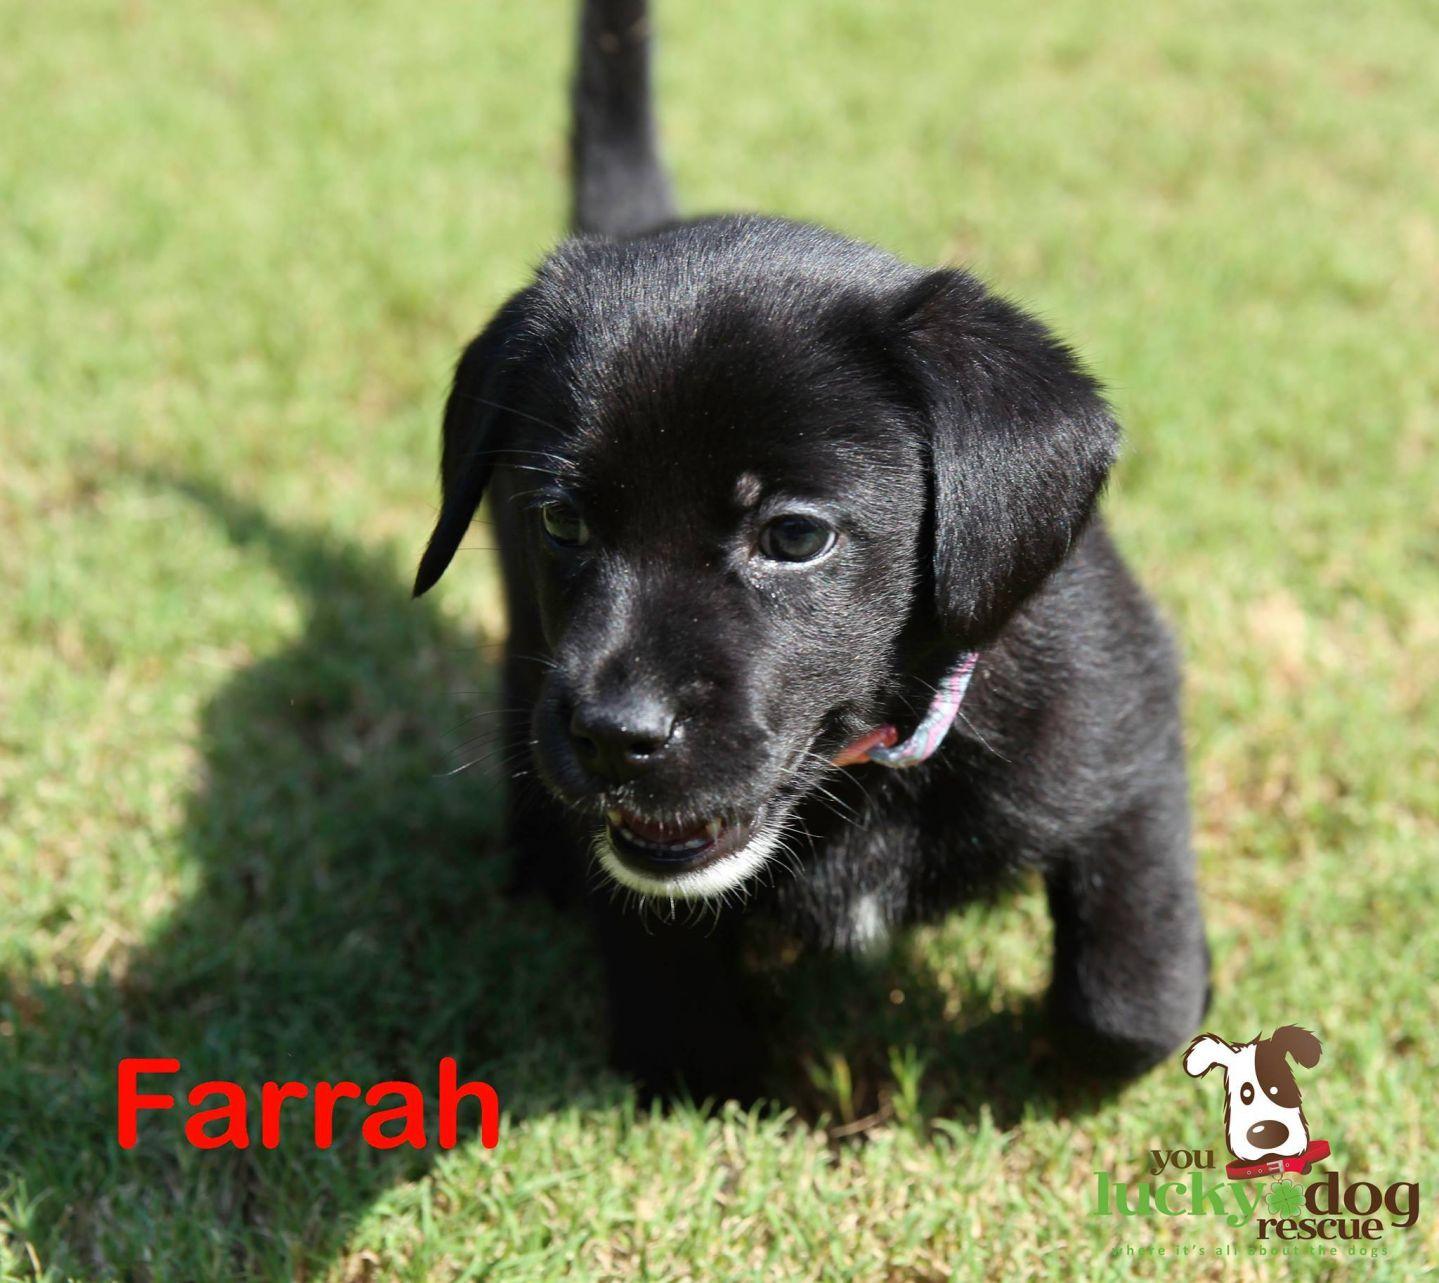 Farrah Kennedy Dog